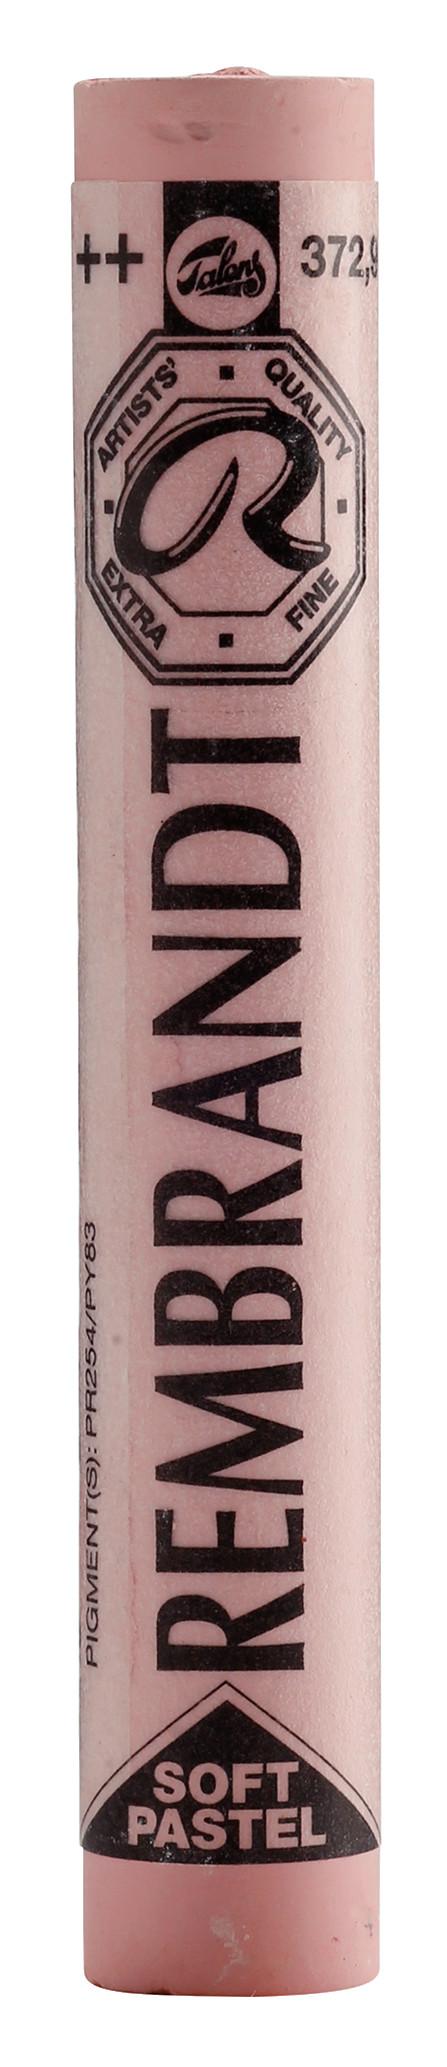 Rembrandt Soft Pastel Round Full Stick Permanent Red(9) (372.9)